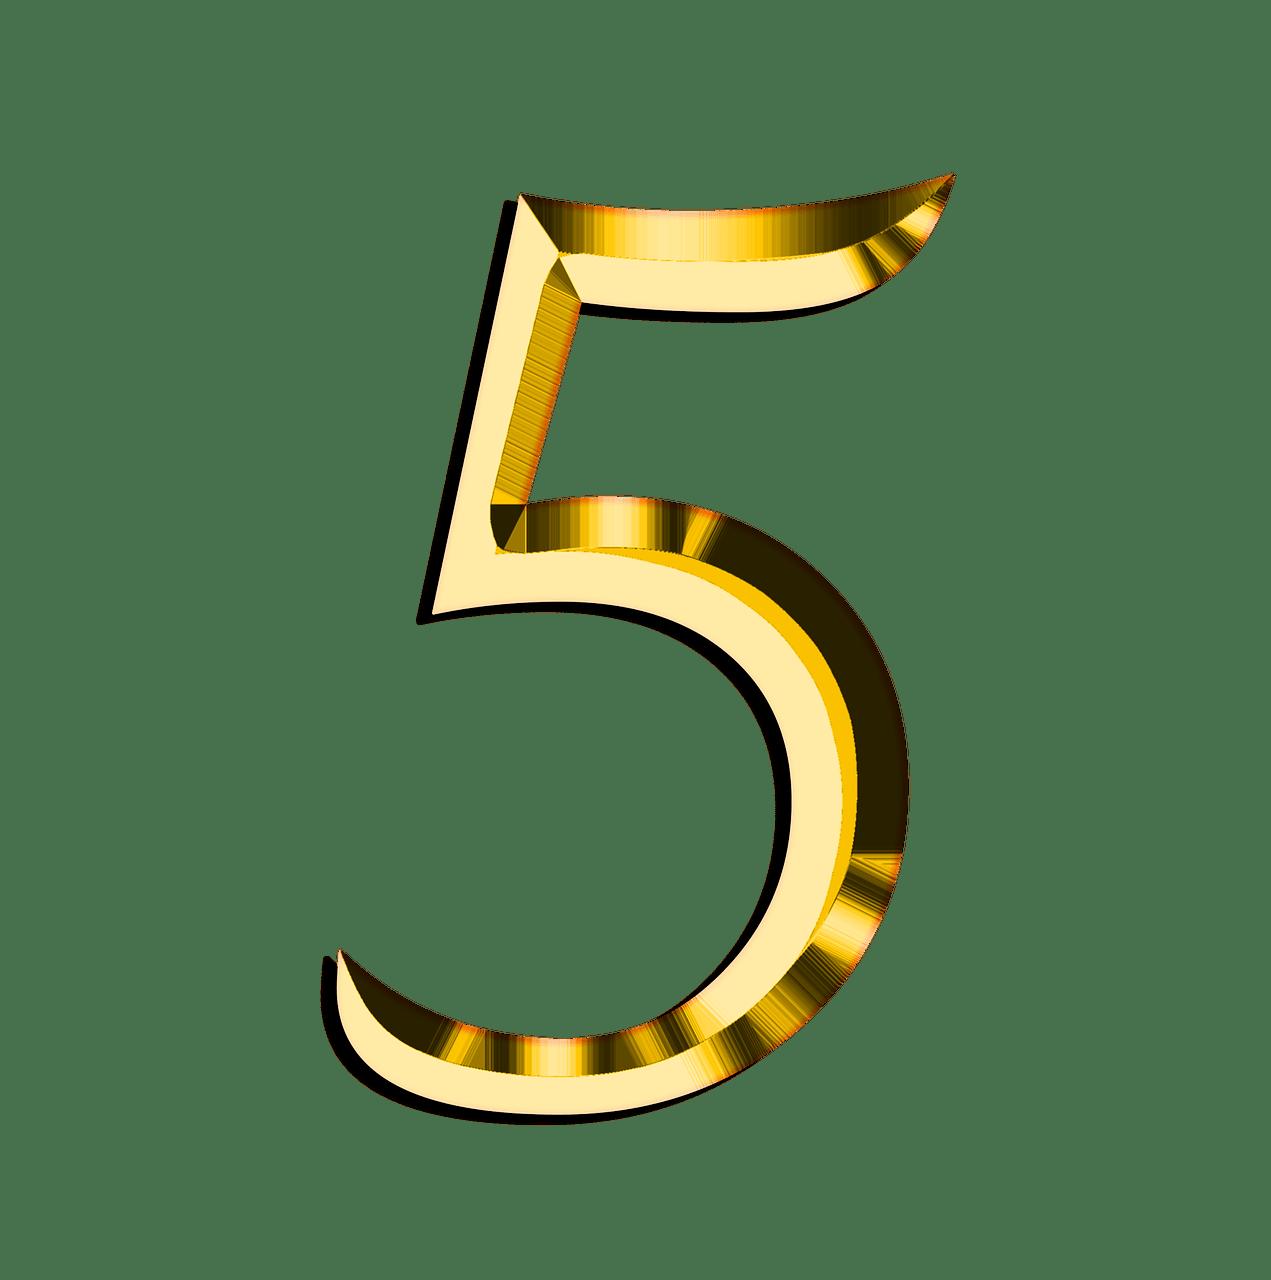 Zlaten Nomer 5 Golden Number Alphabet And Numbers Numbers